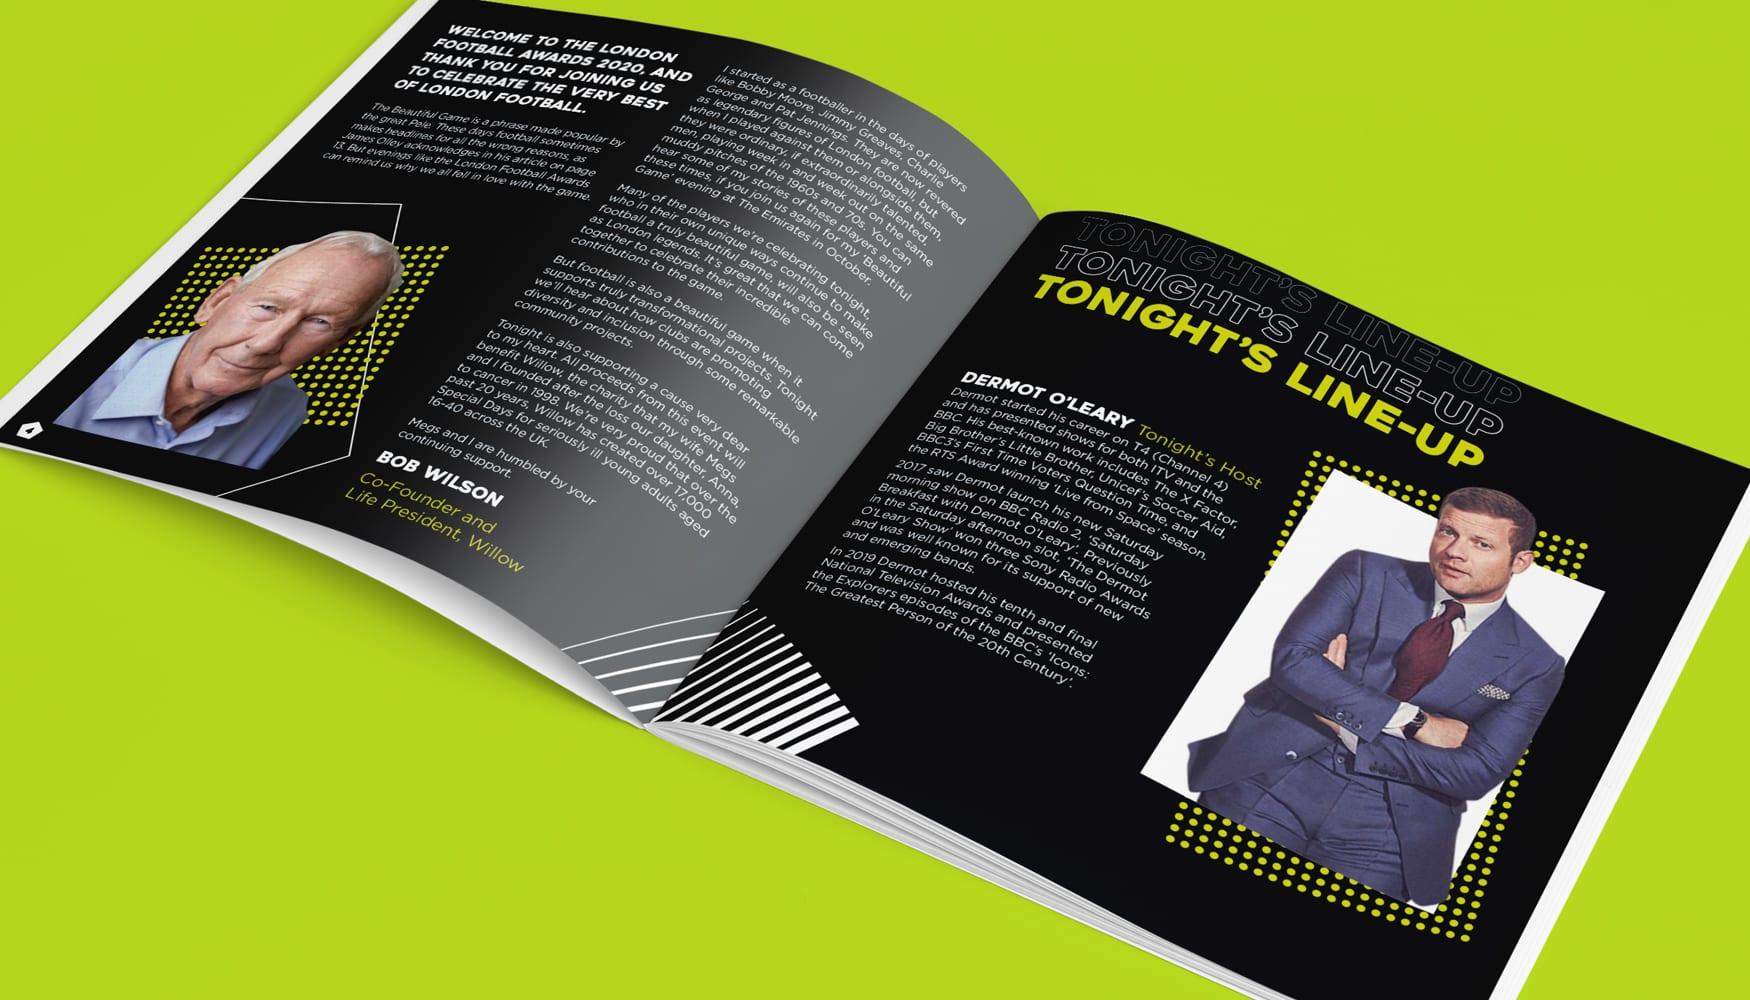 London Football Awards 2020 event brochure